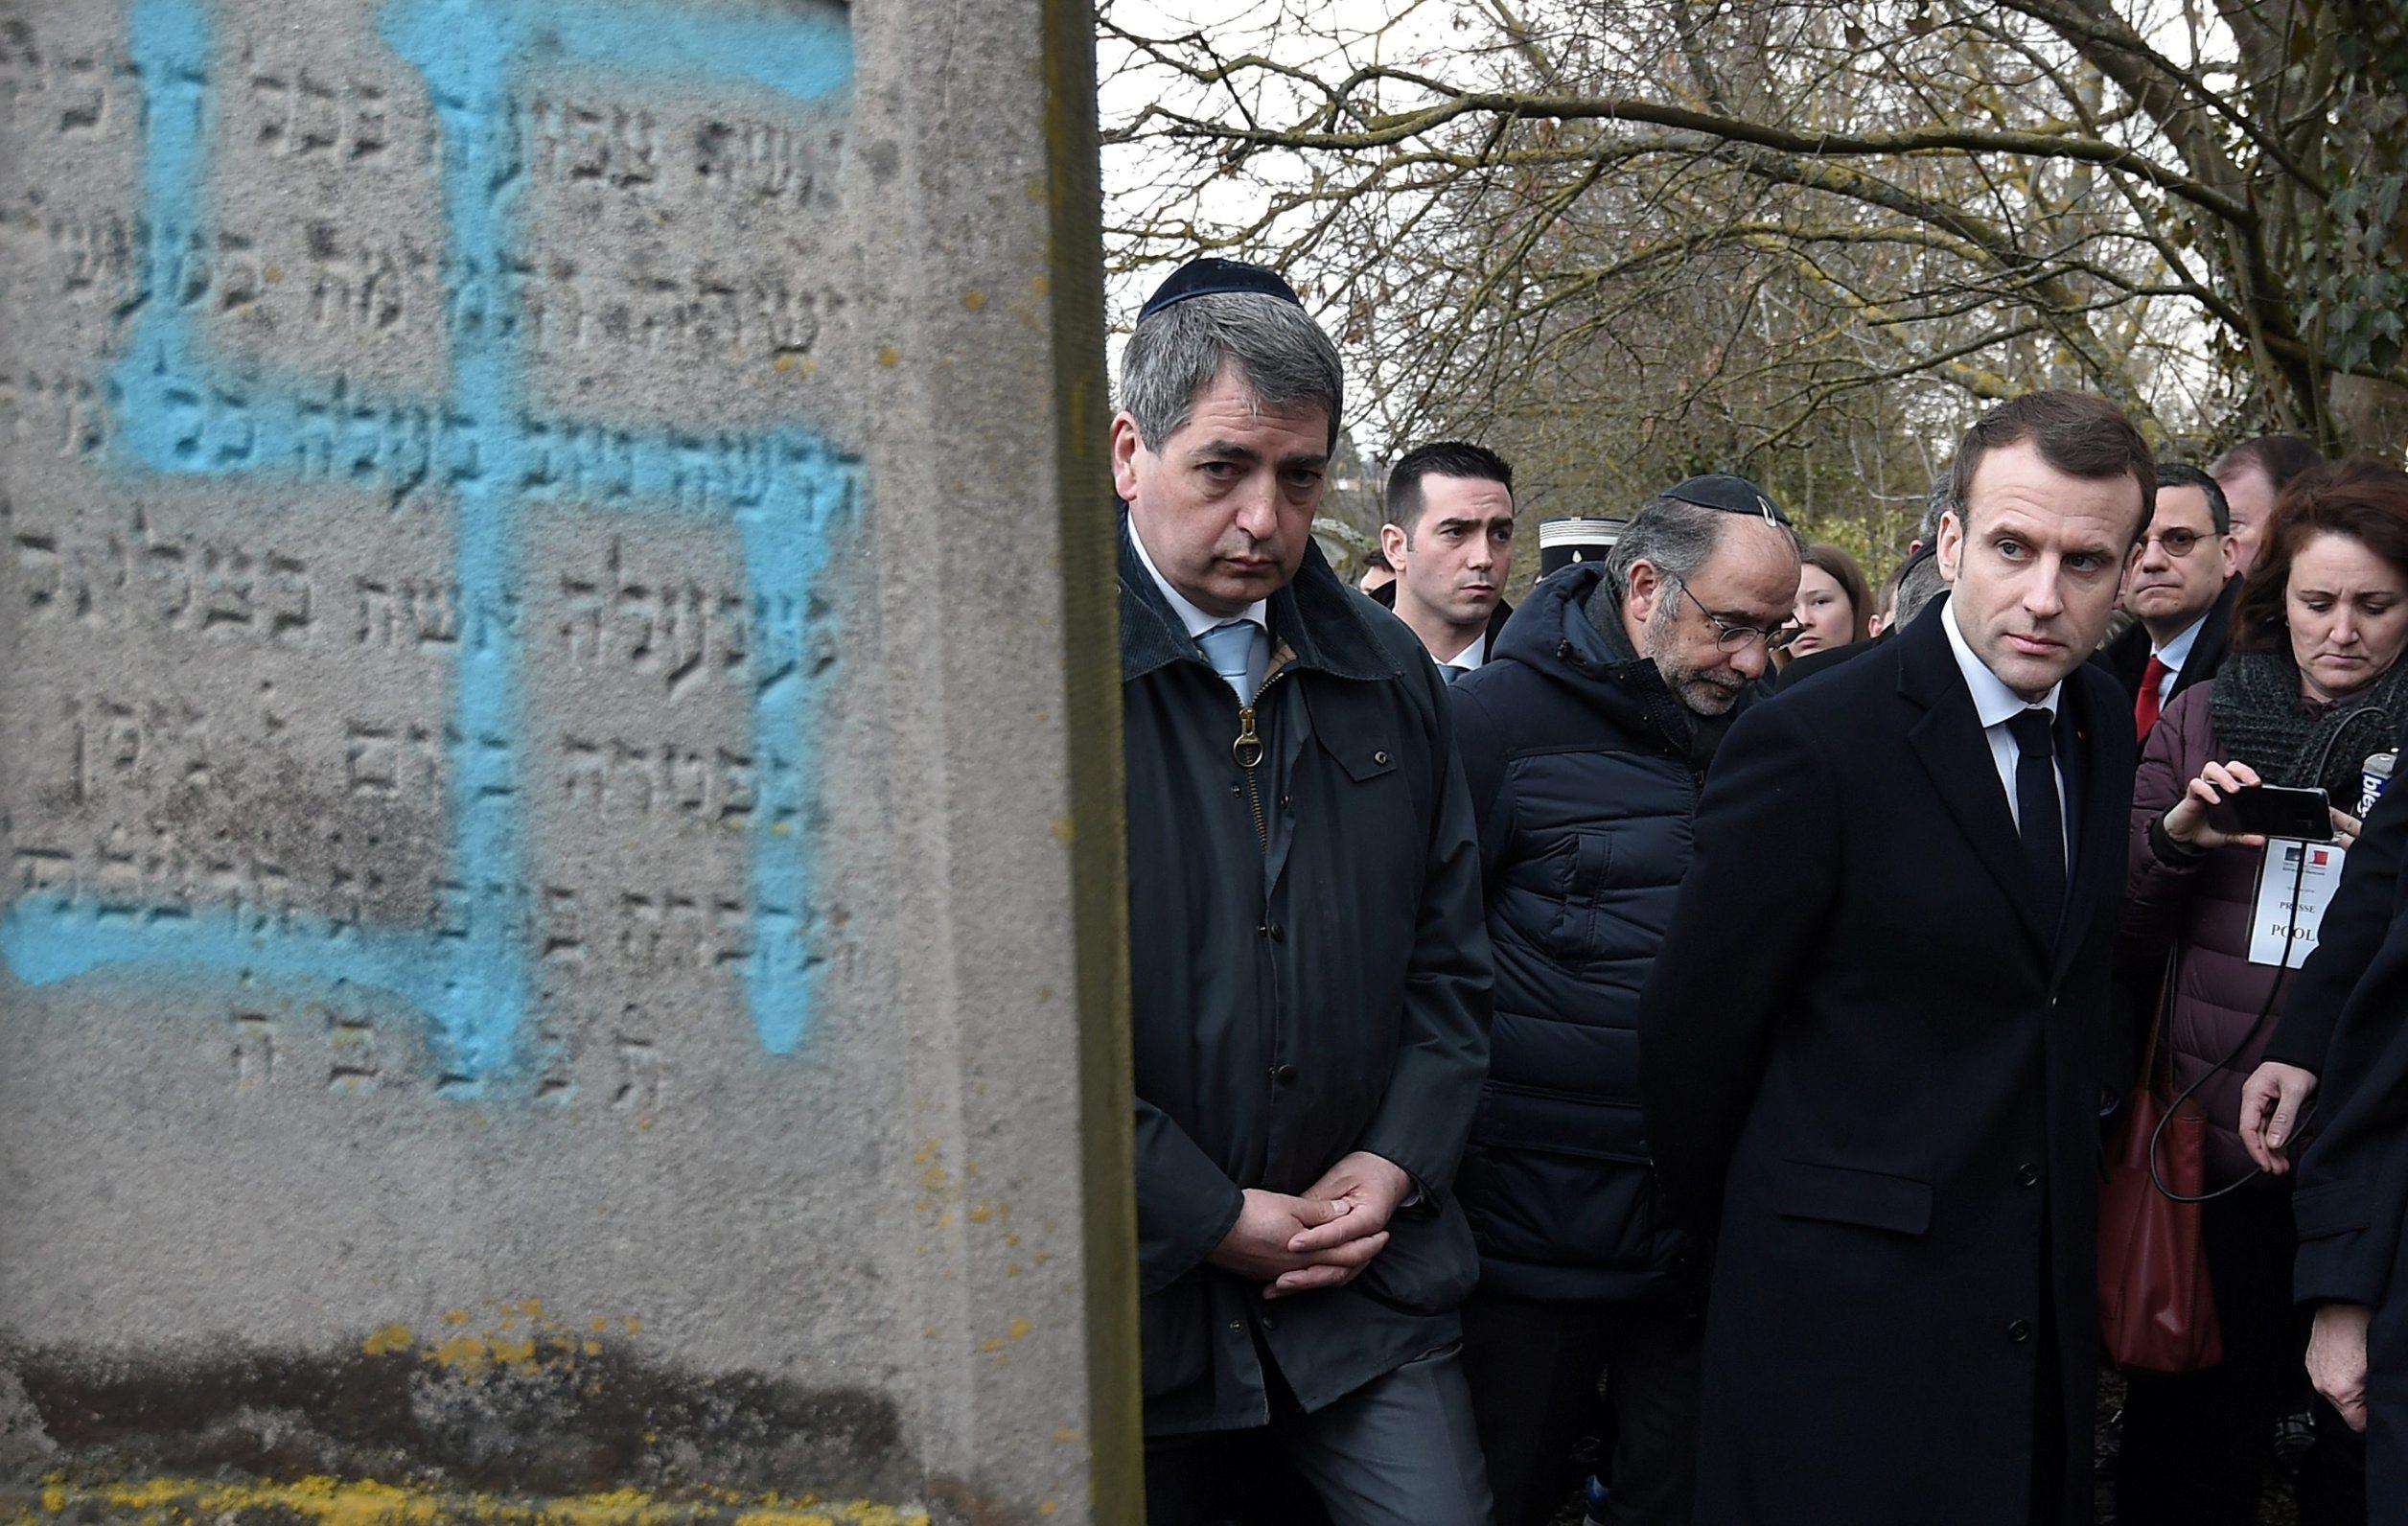 Francuski predsjednik Emmanuel Macron na oskrvnutom groblju